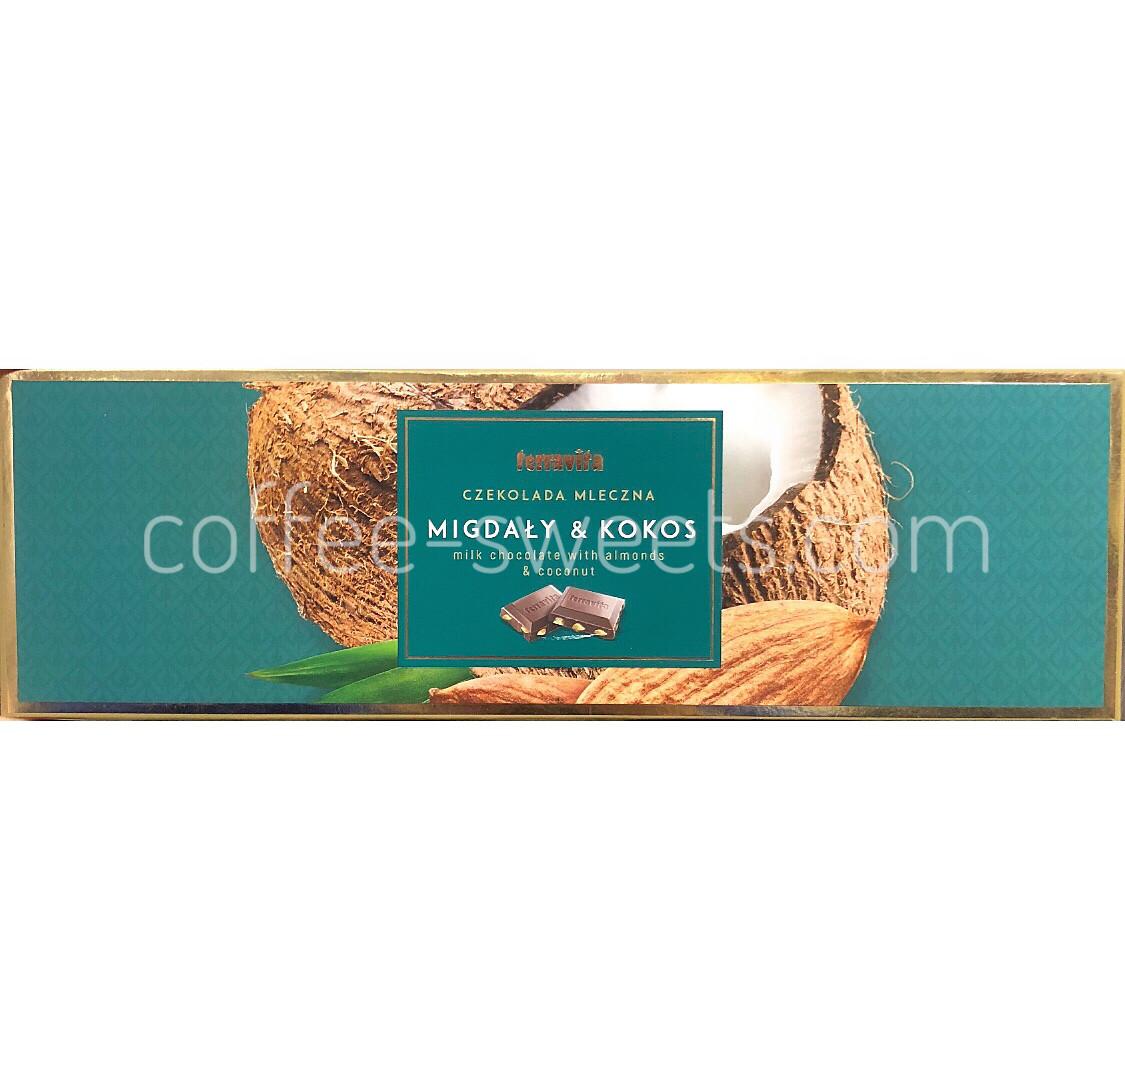 Шоколад молочный Terravita Migdaly & Kokos миндаль и кокос 225 гр